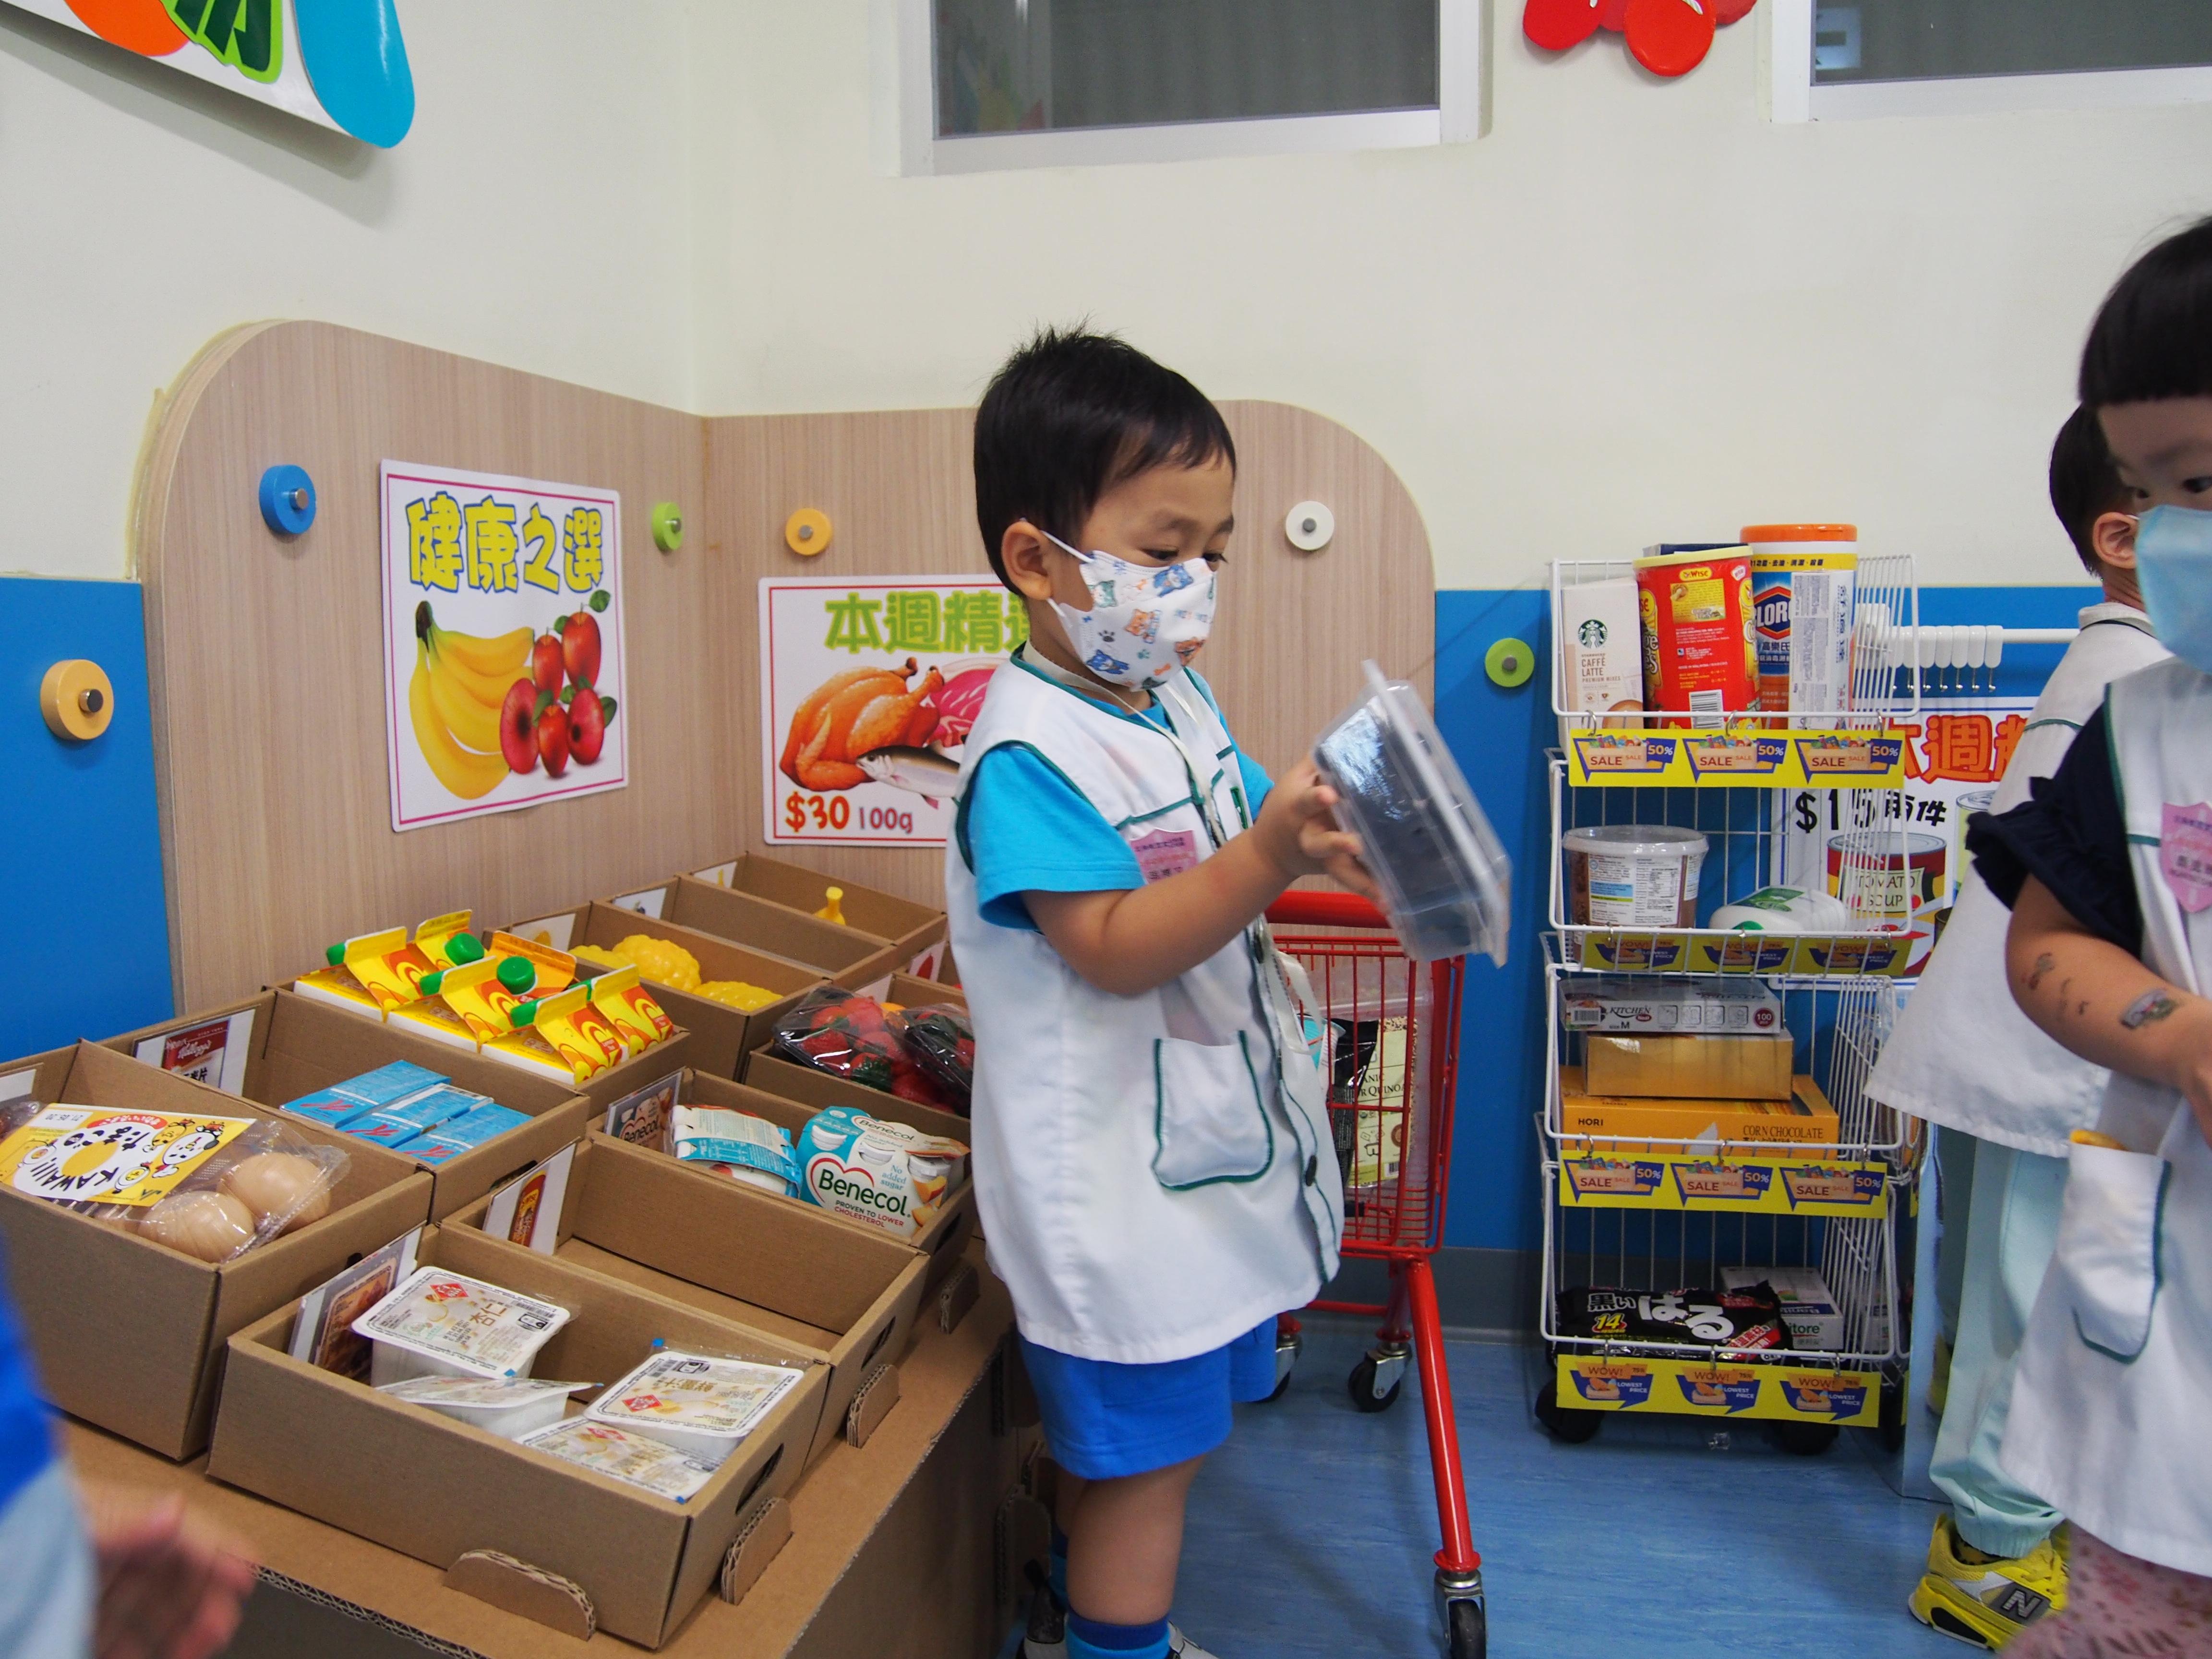 http://npmc.edu.hk/sites/default/files/p1010240_0.jpg